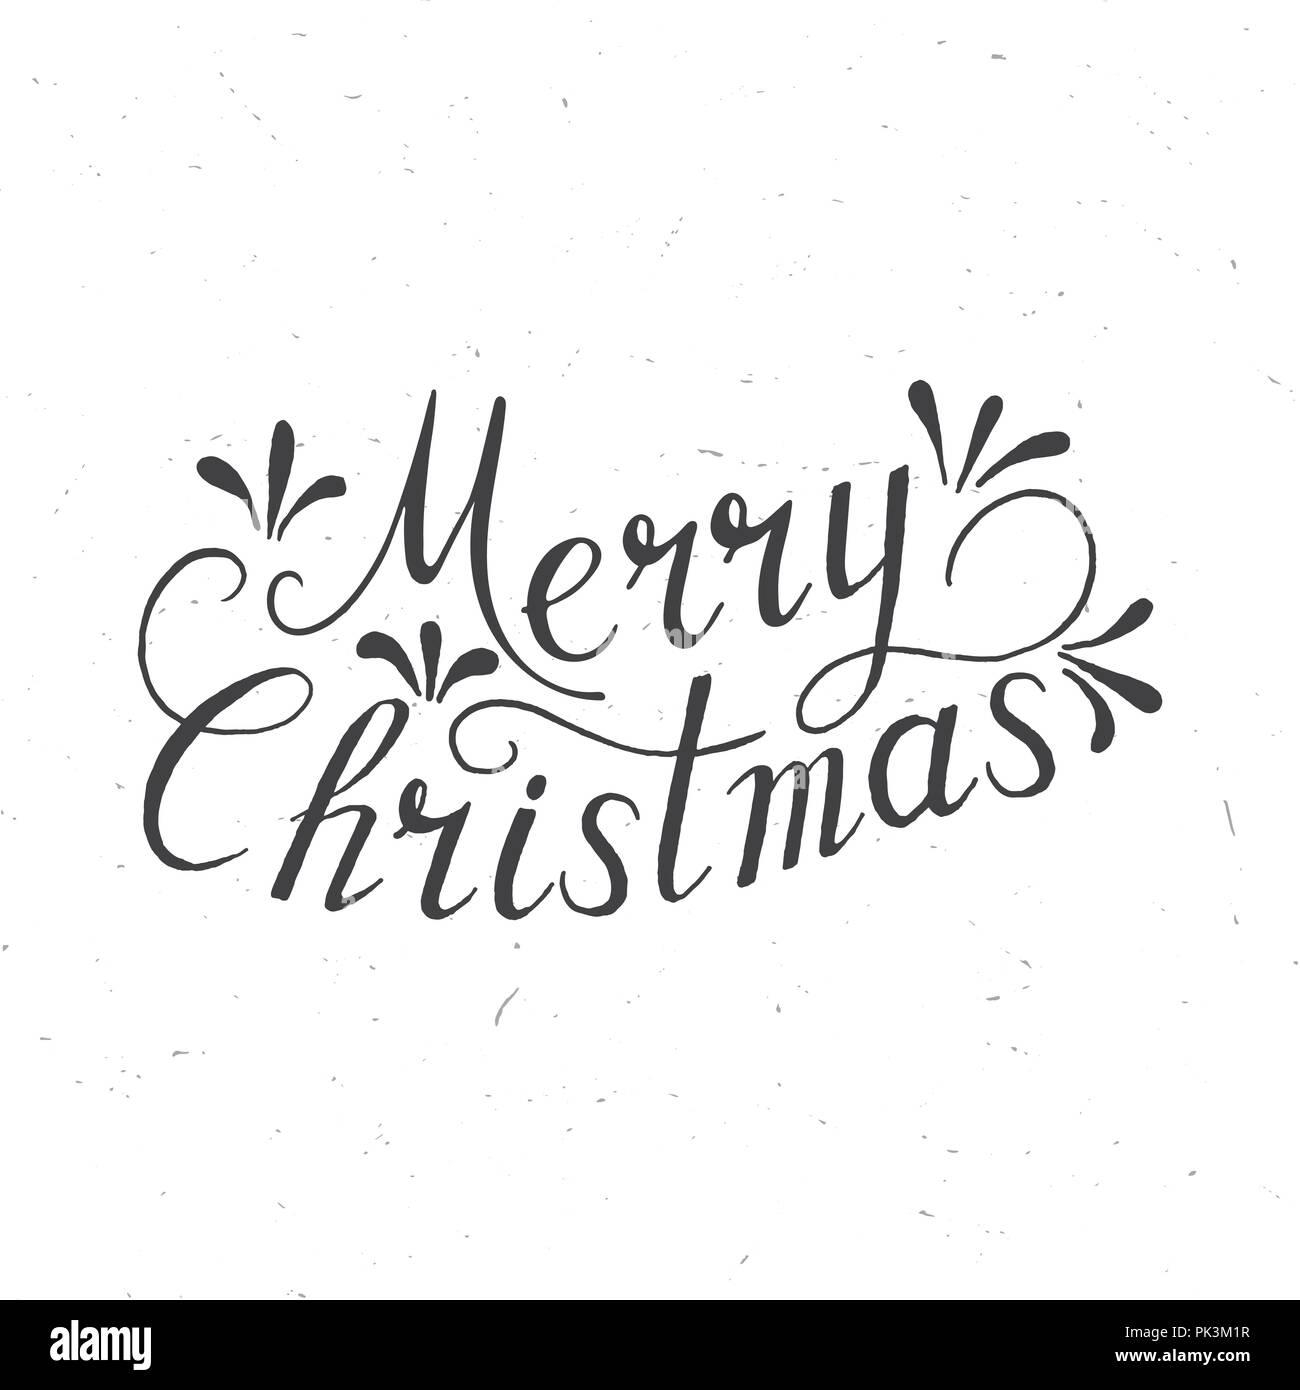 merry christmas lettering design vector illustration element for